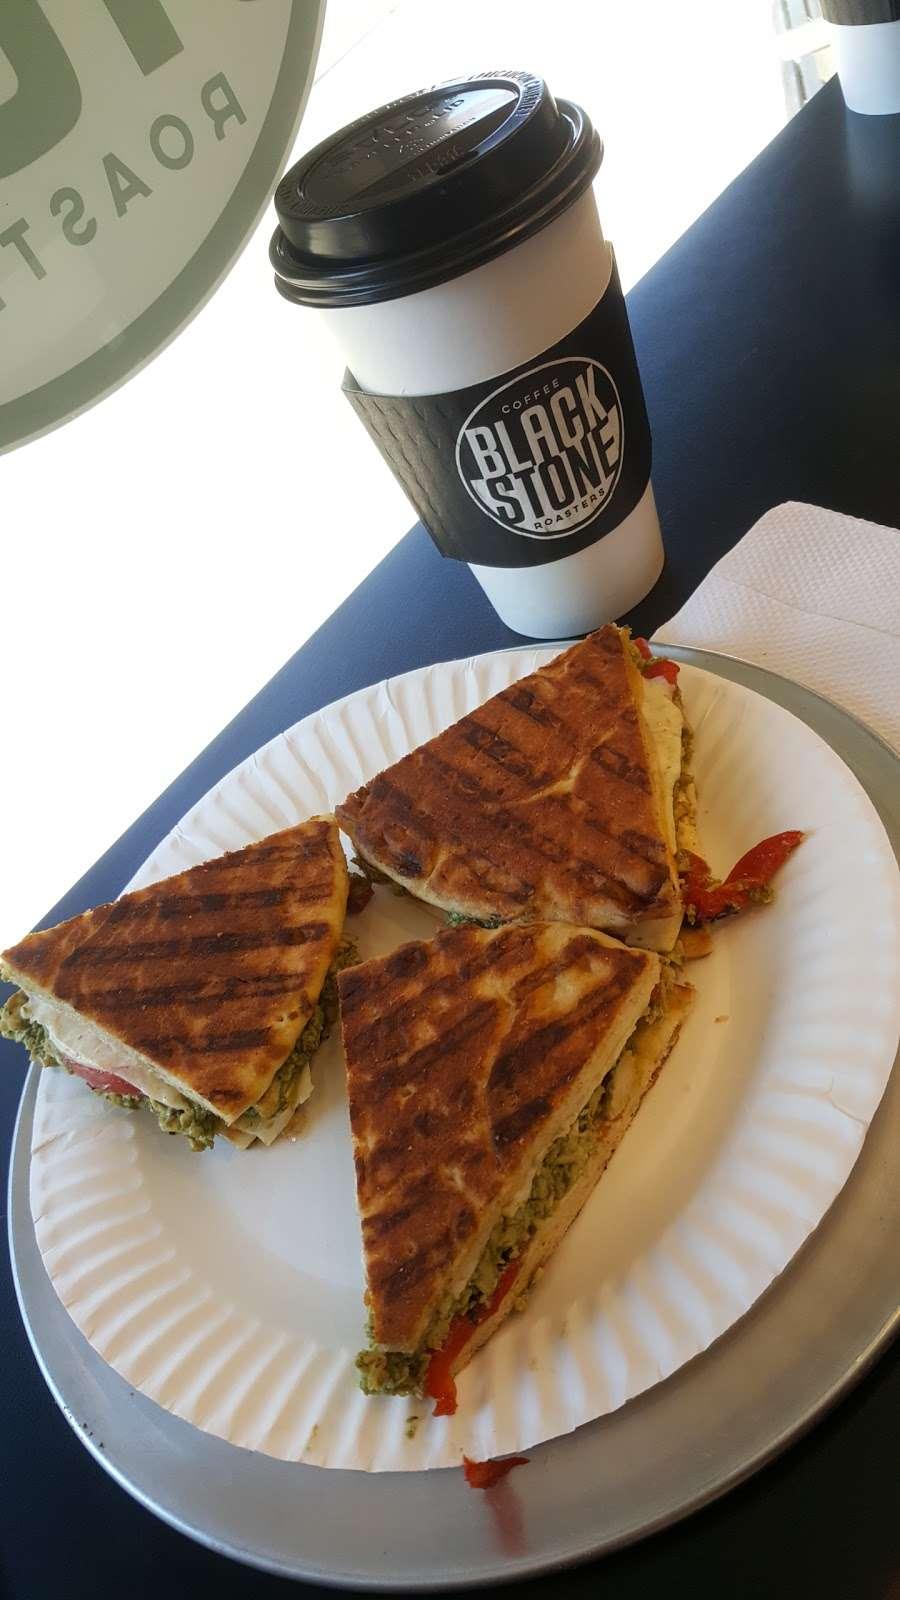 Blackstone Coffee Roaster - cafe    Photo 7 of 10   Address: 502 Hudson St, New York, NY 10014, USA   Phone: (212) 989-6131